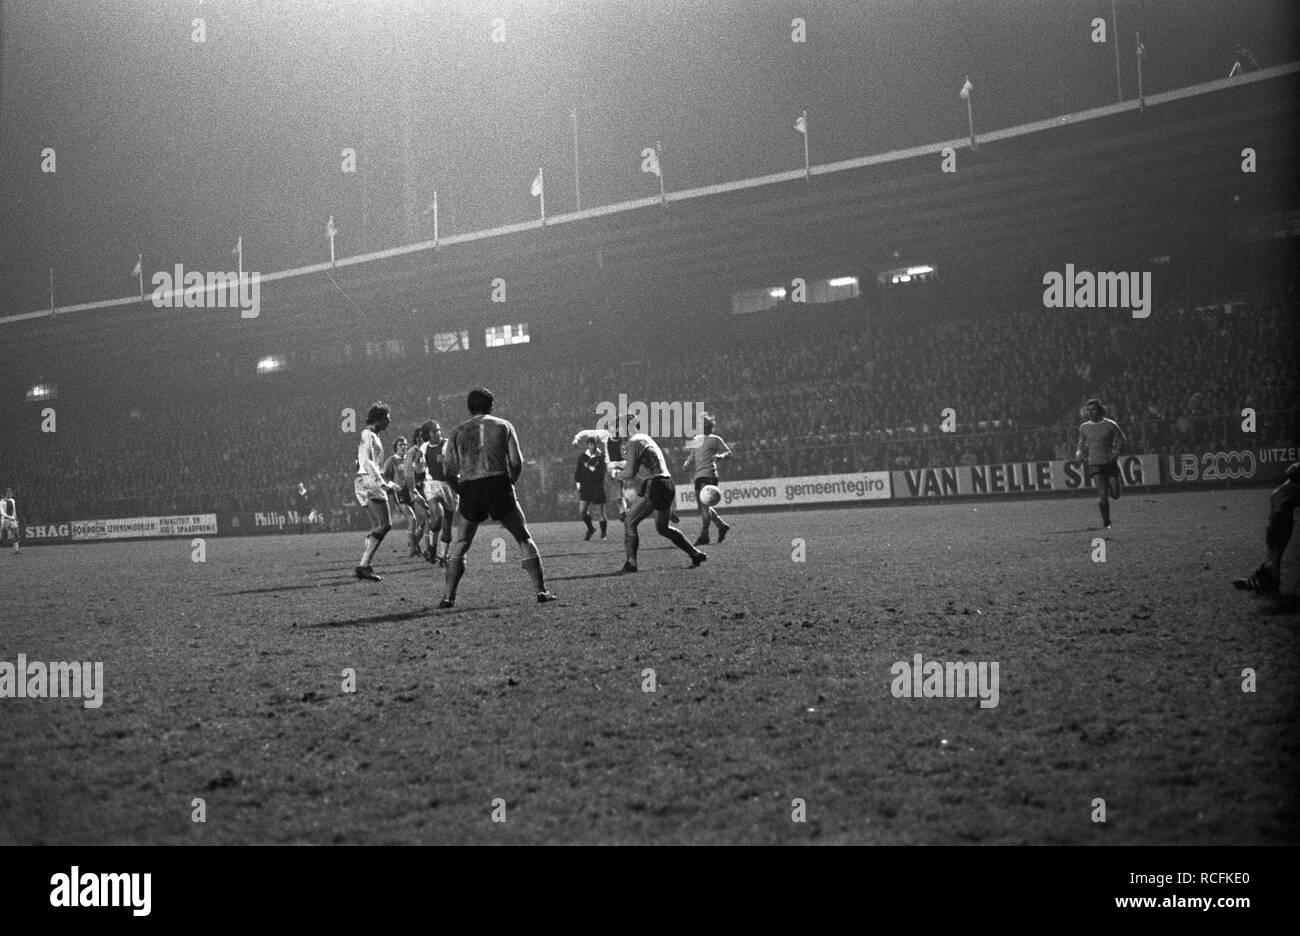 Ajax tegen Twente 1-0, spelmomenten, Bestanddeelnr 925-2469. - Stock Image